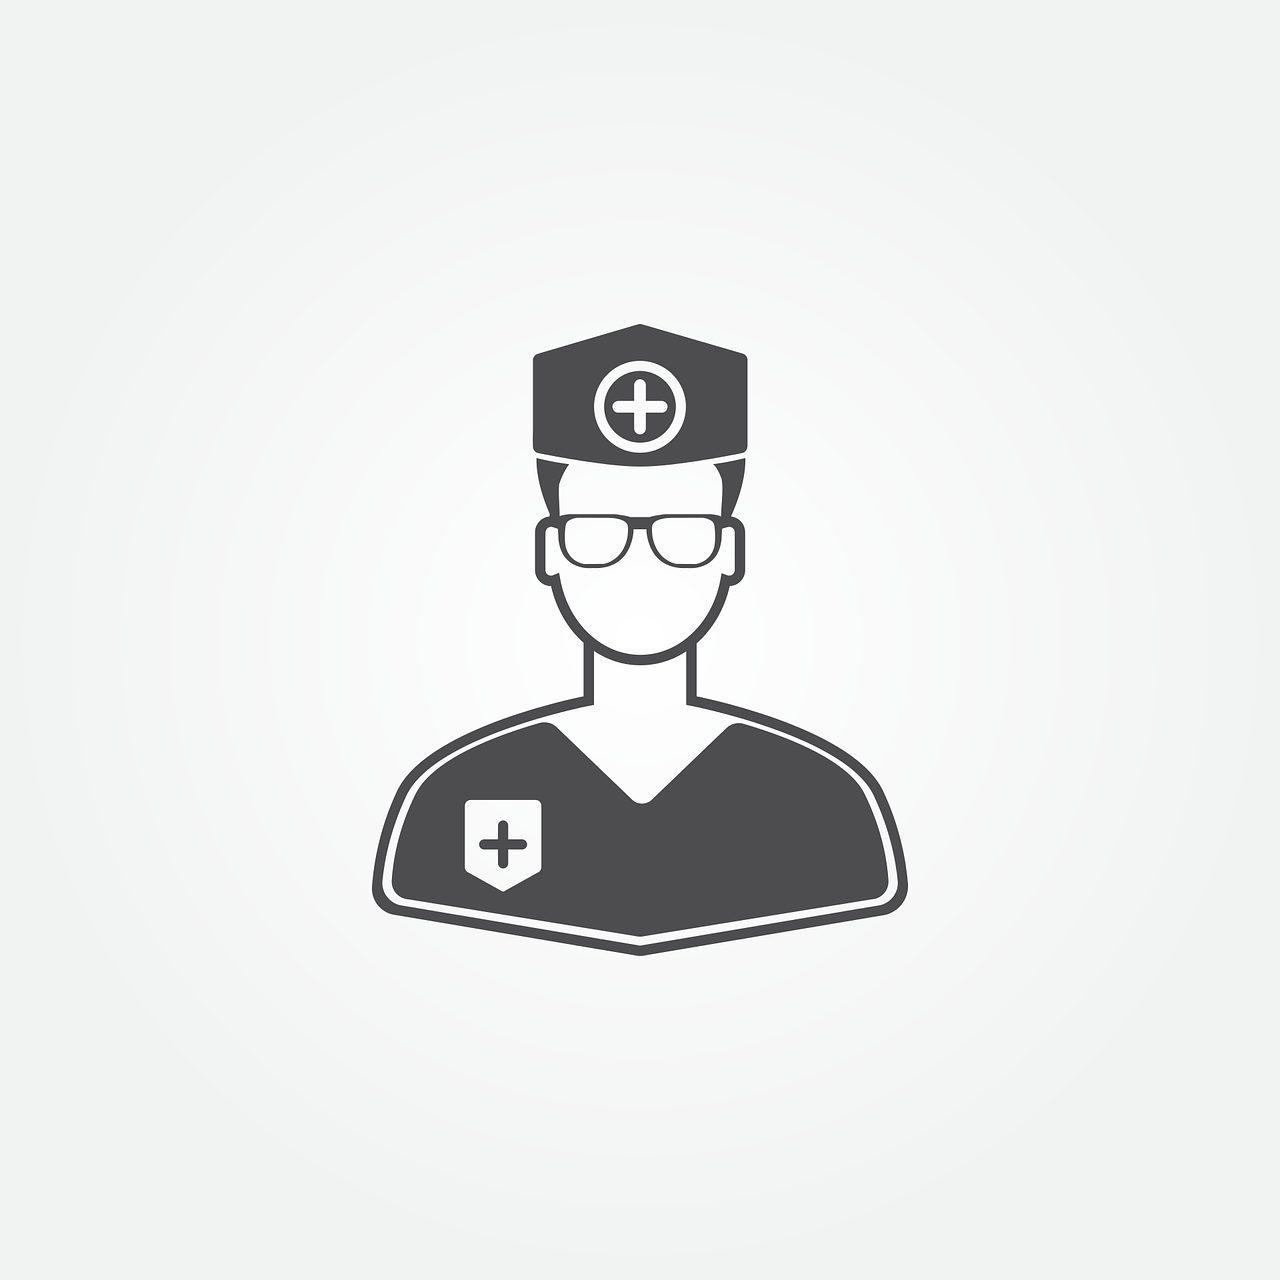 Ransijn R spoedhulp tandarts